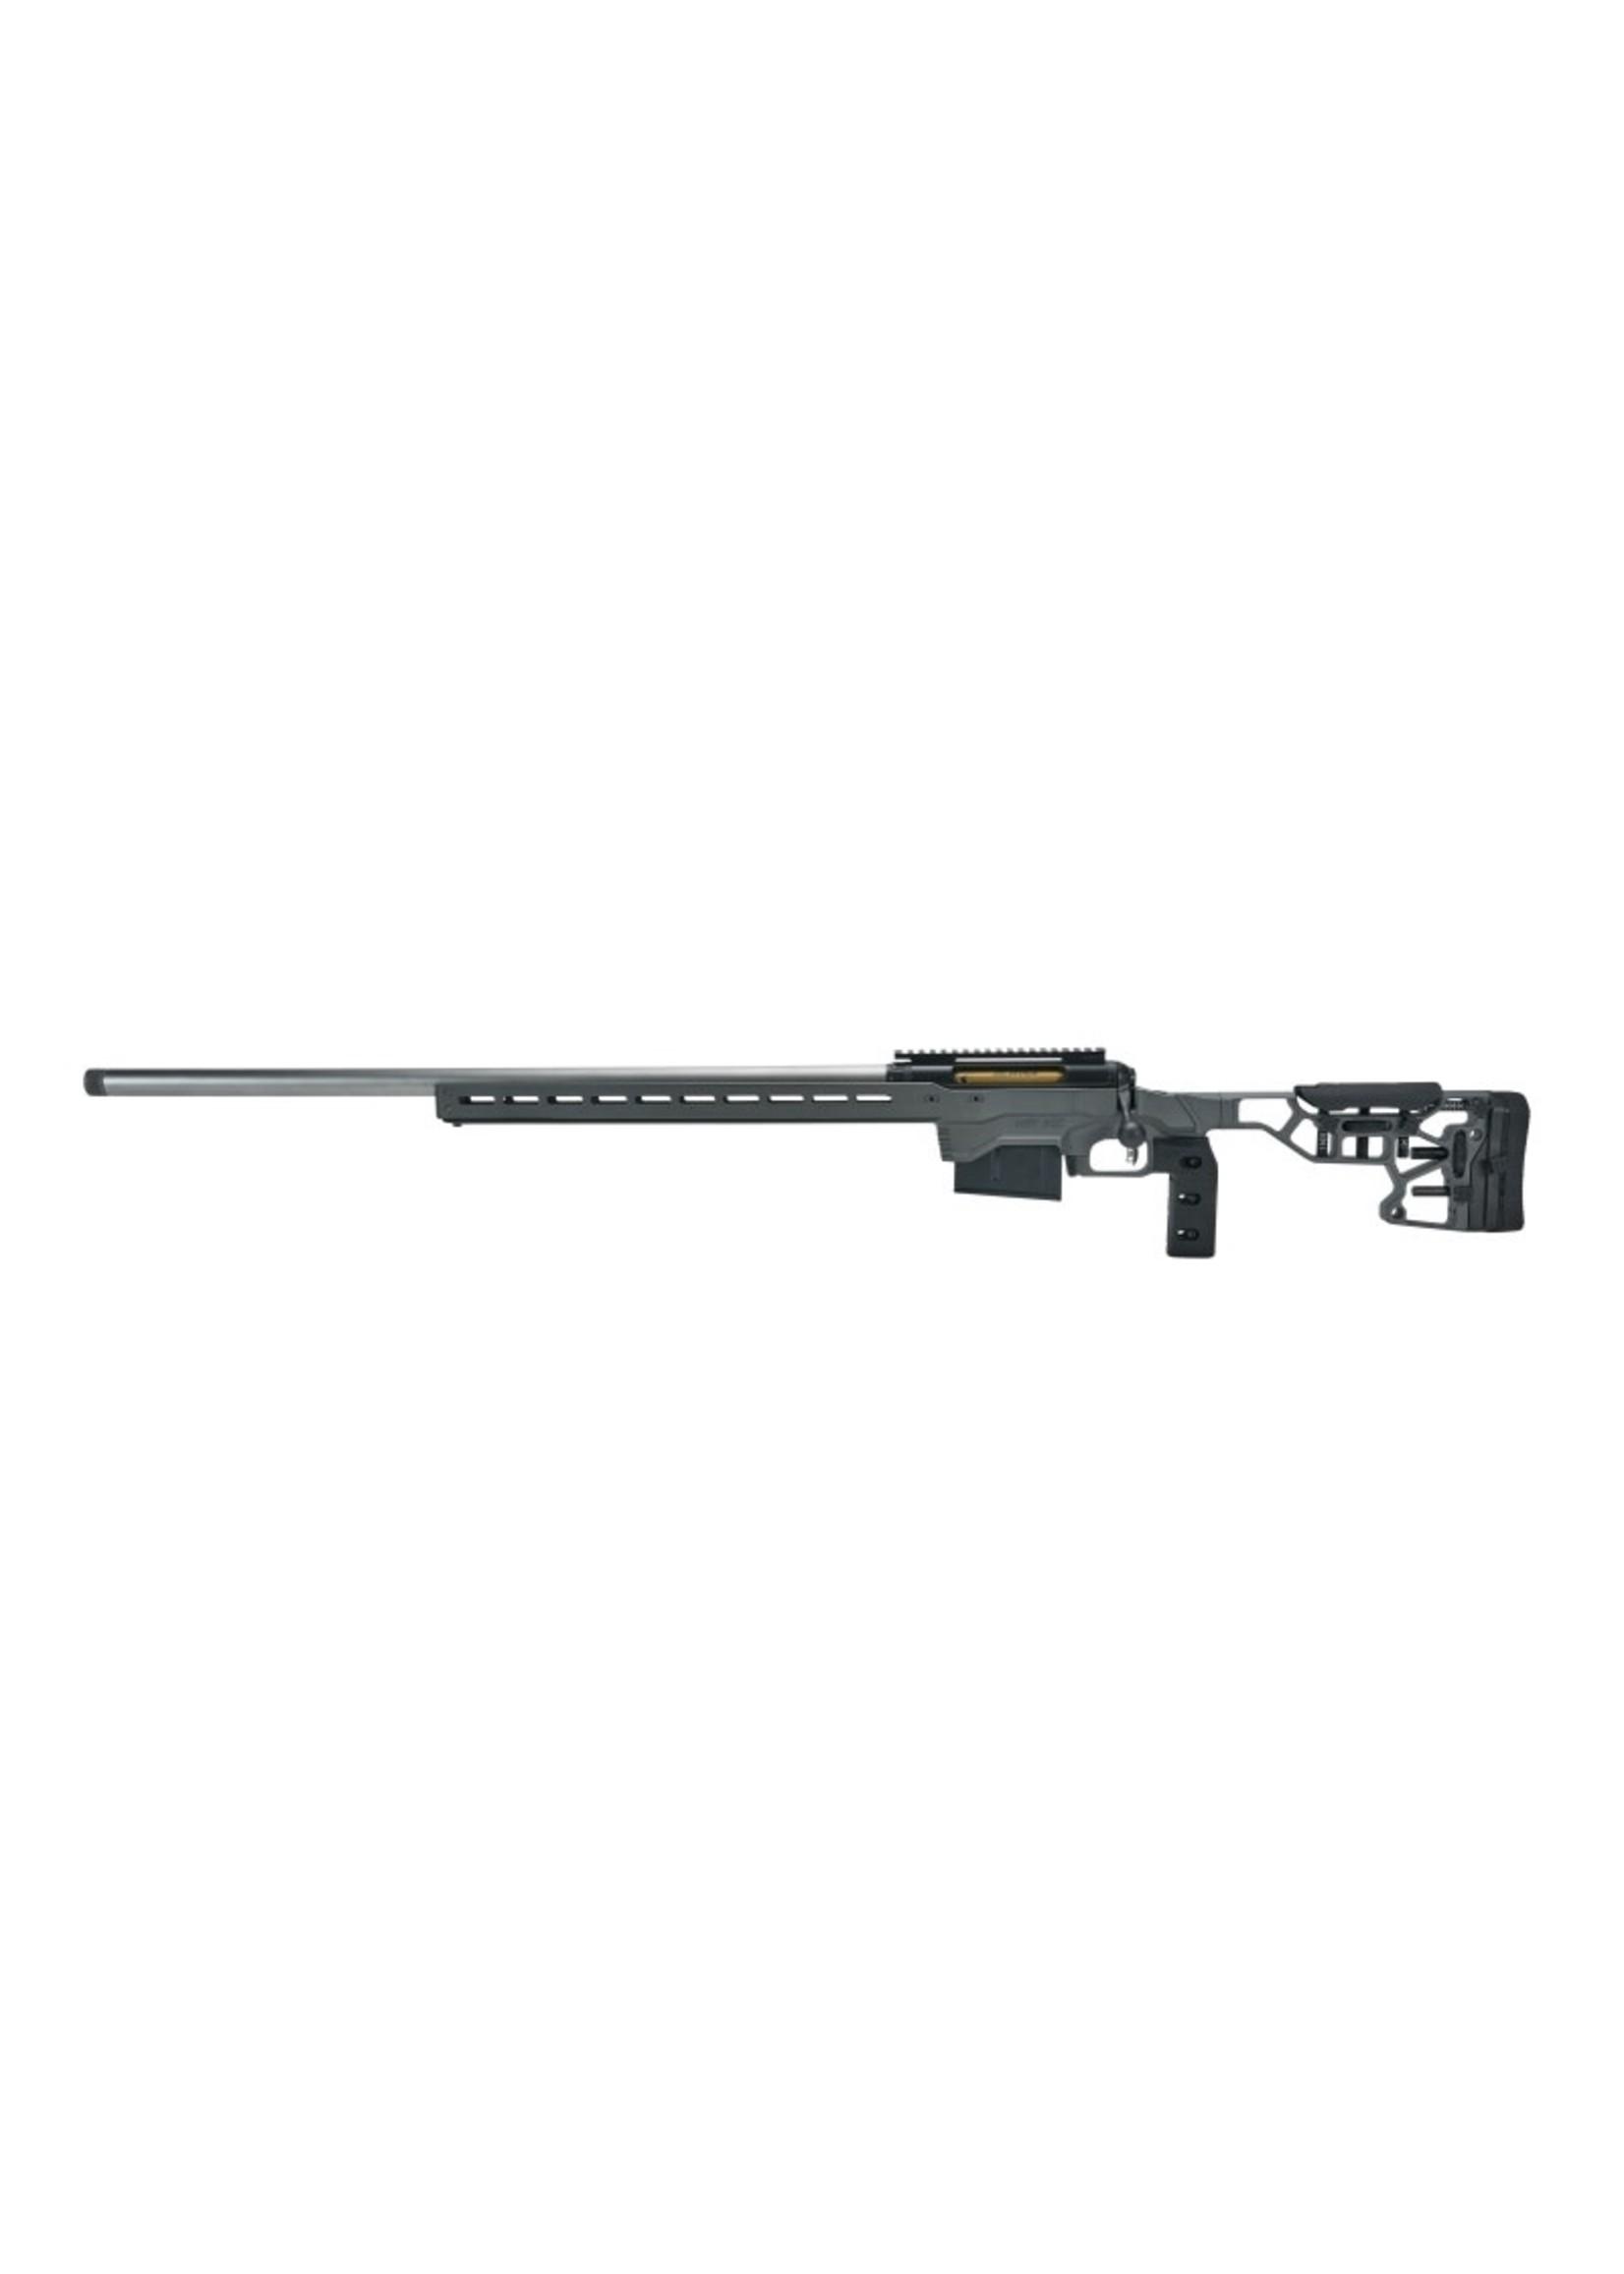 "Savage Savage Arms 110 Elite Precision Rifle 300 PRC 30"" 5+1, LH"